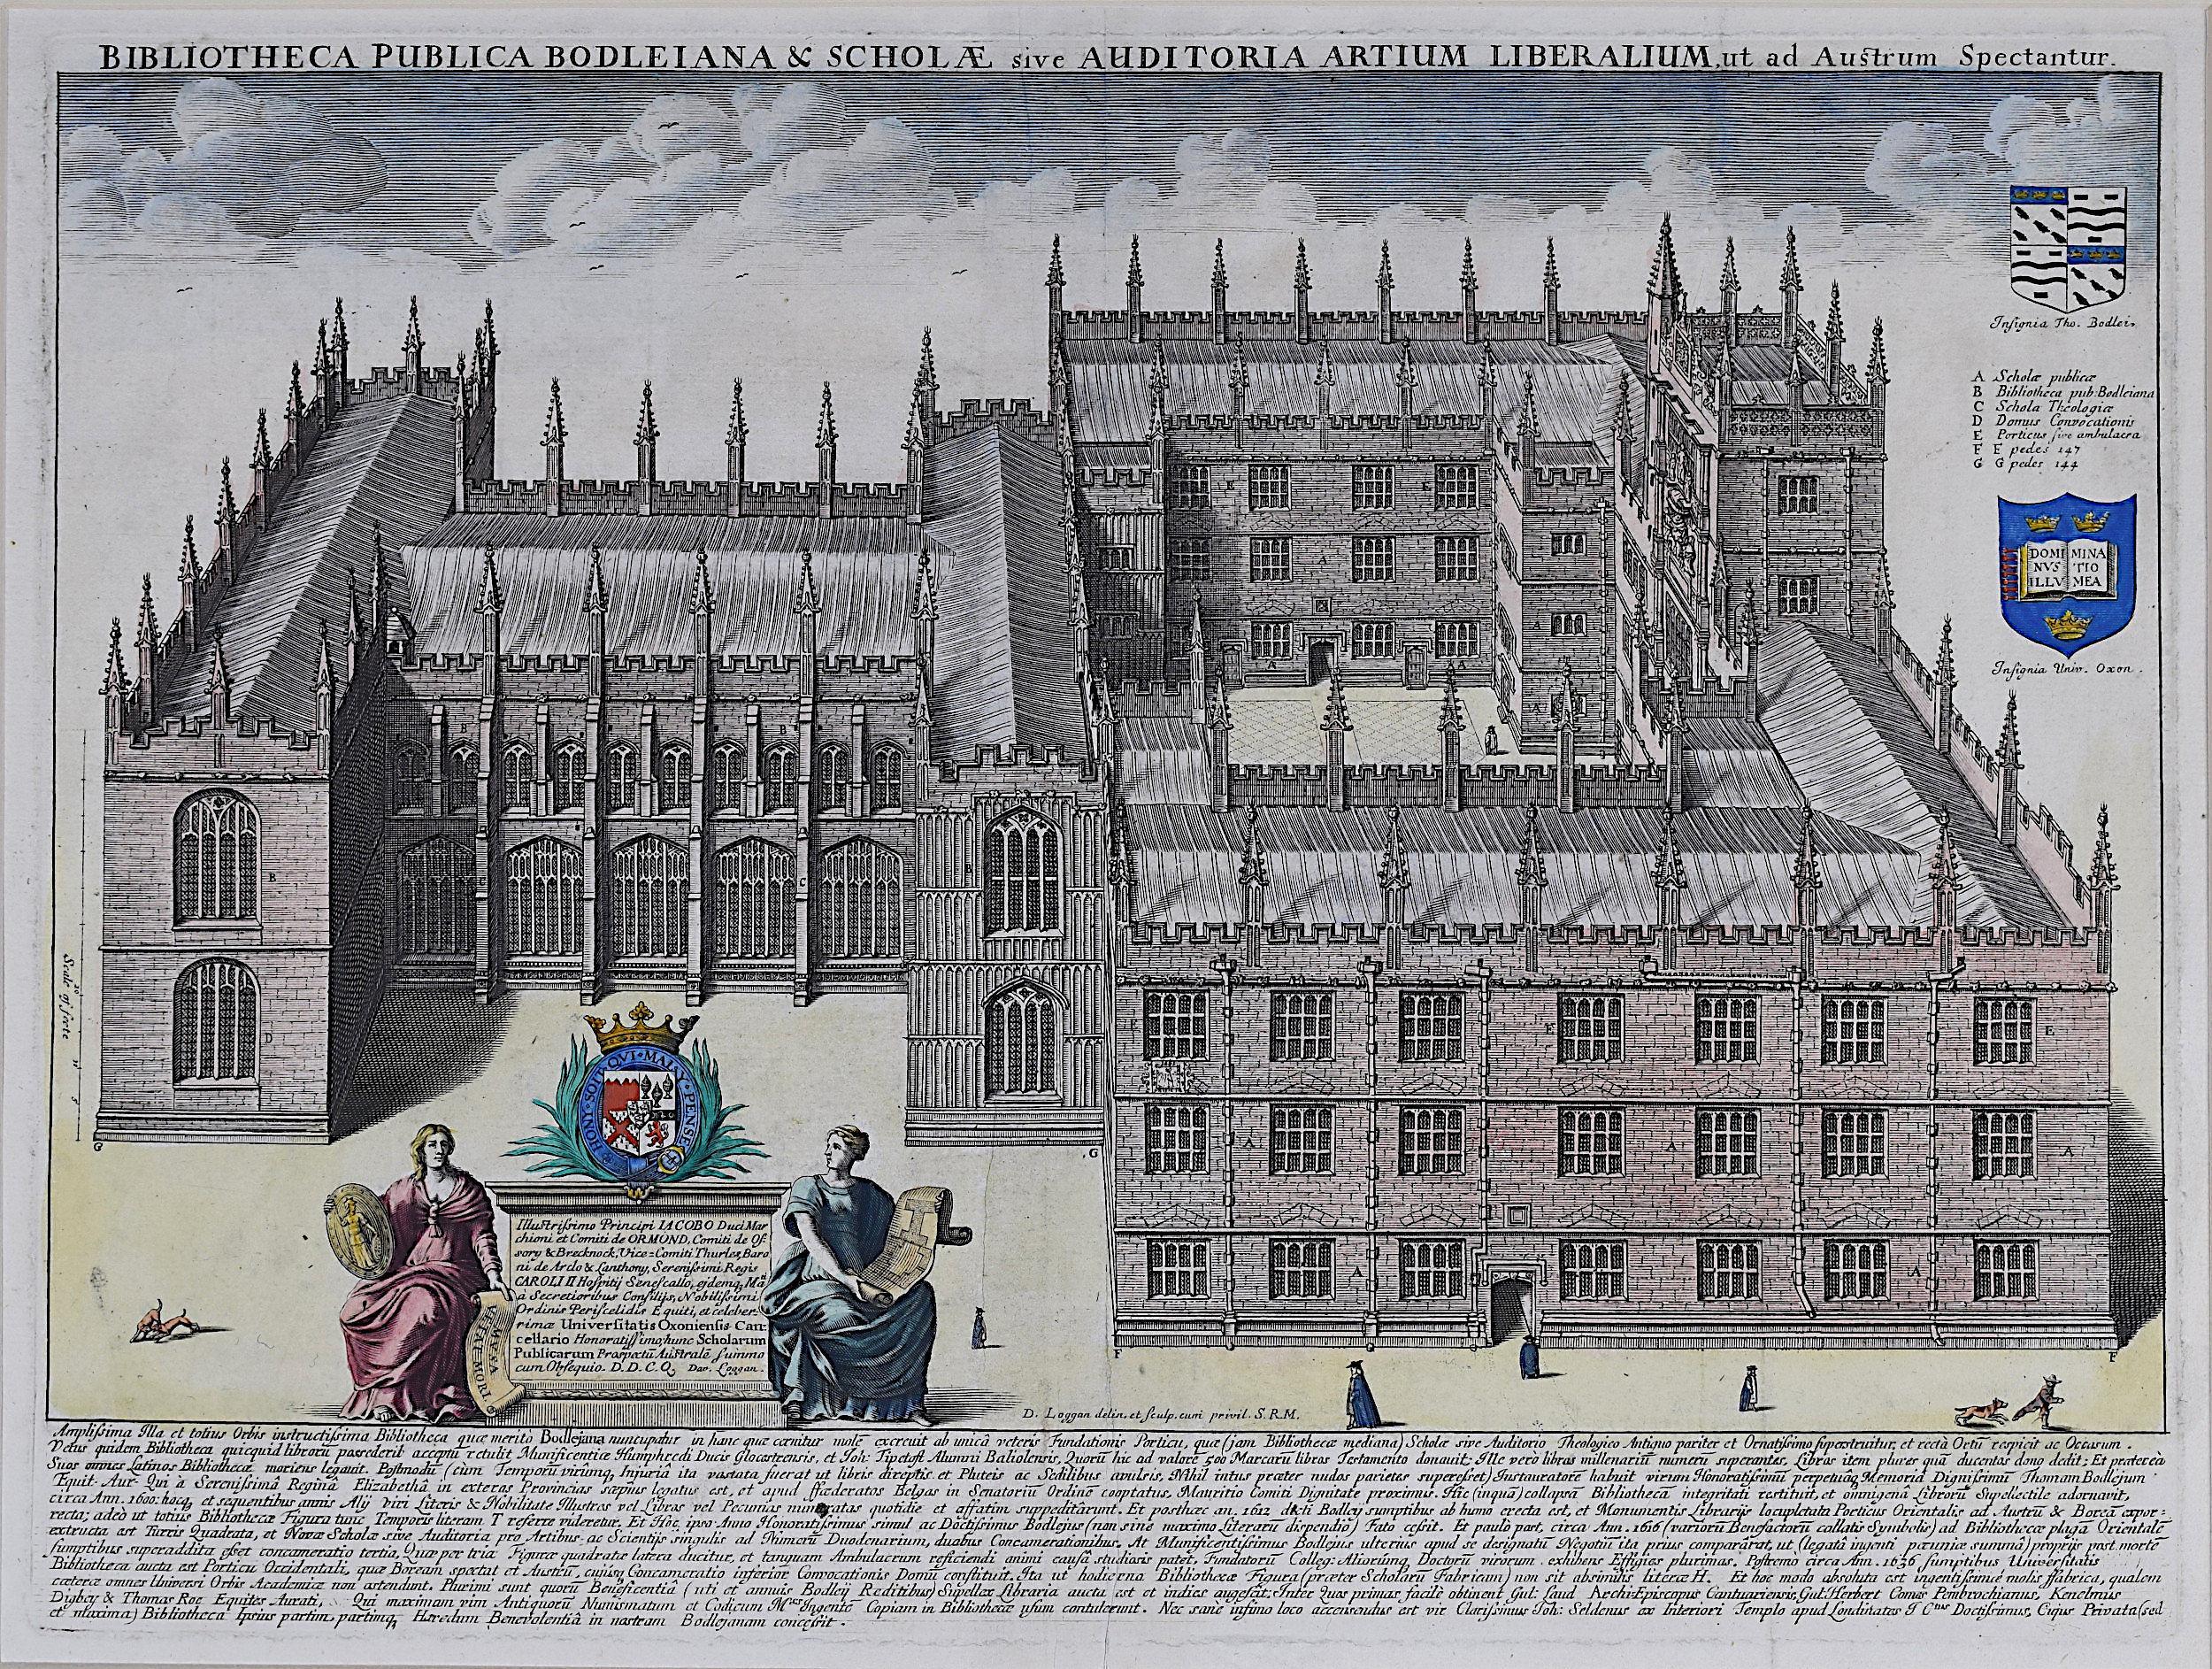 David Loggan Bodleian Library Oxford Aerial view 1675 engraving Bibliotheca